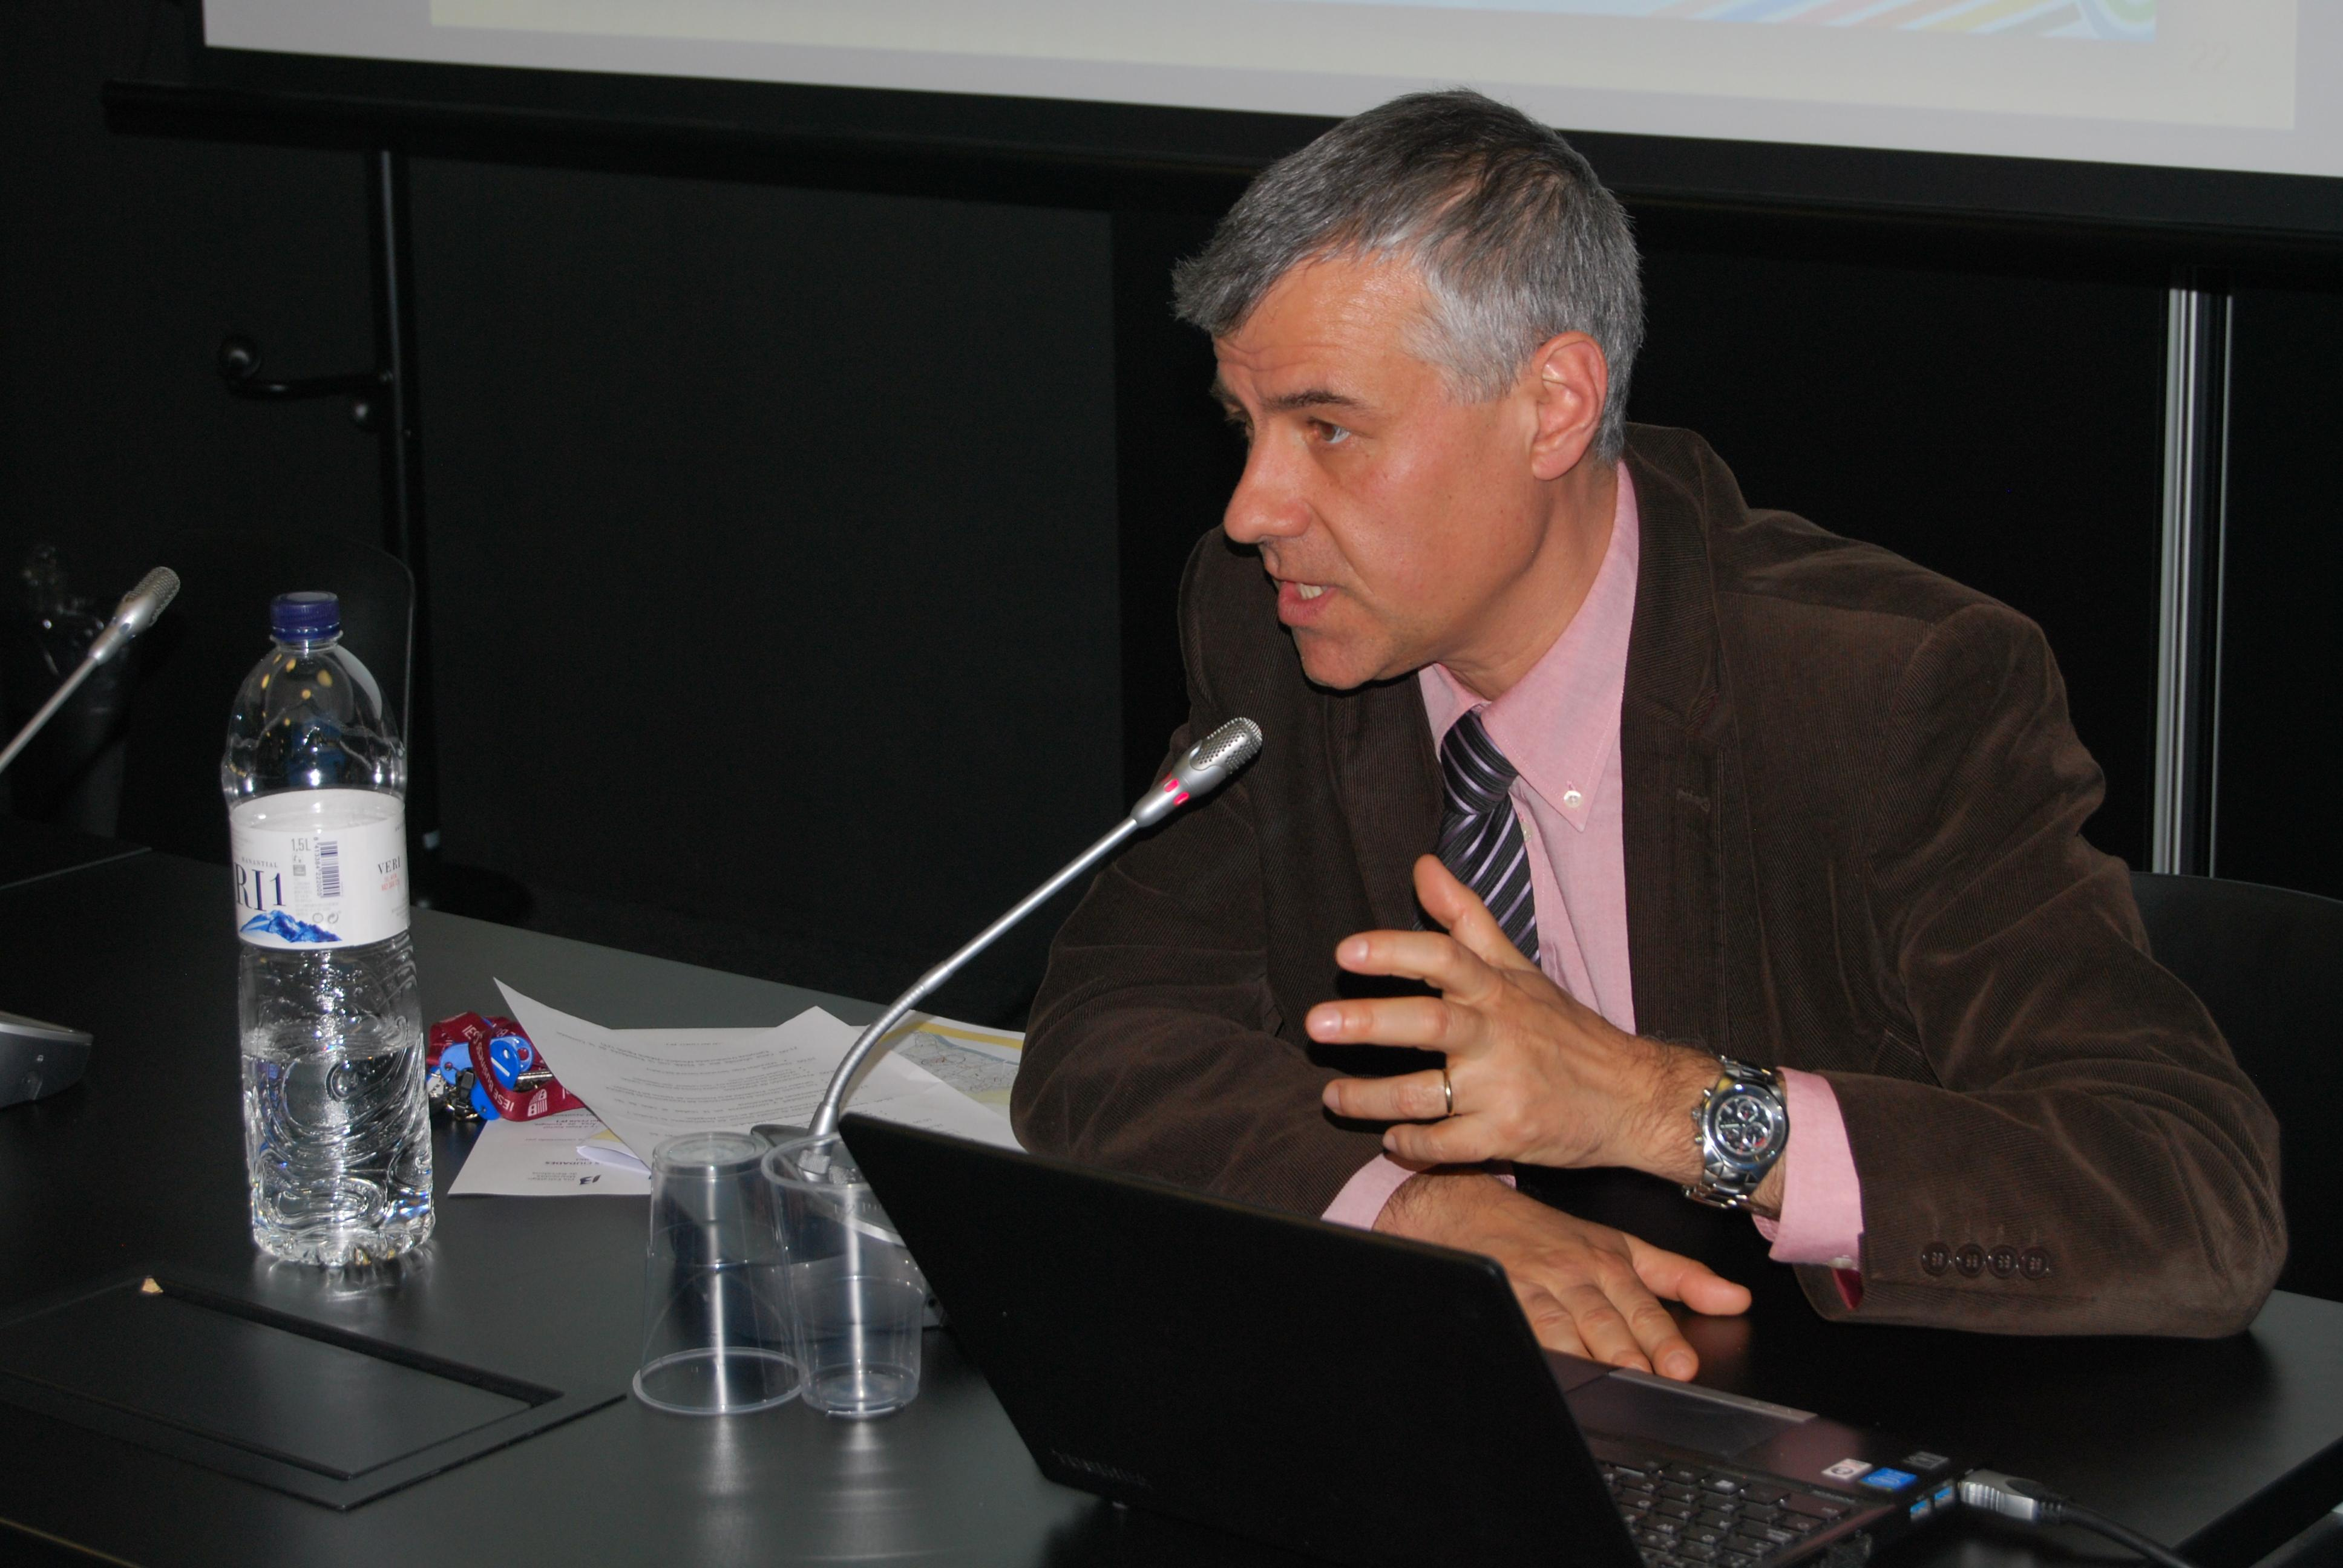 Francesc Xandri, de la operadora Tusgsal de Santa Coloma de Gramenet